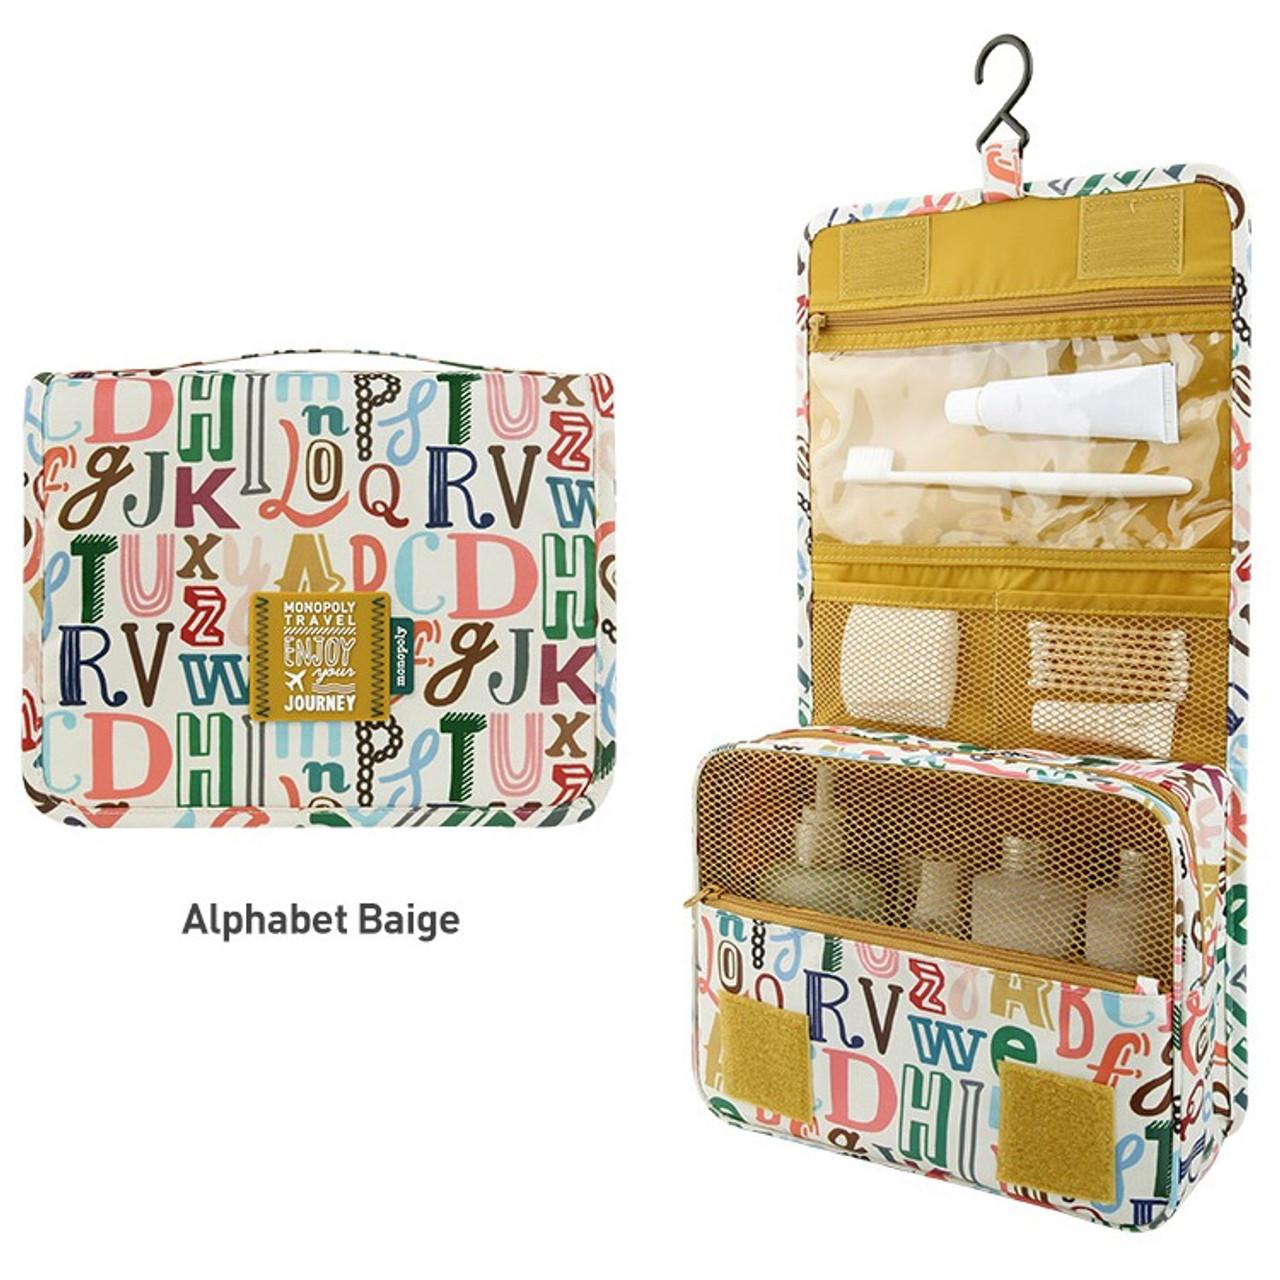 187bbc17d6bd Alphabet beige - Enjoy journey large travel hanging toiletry pouch bag